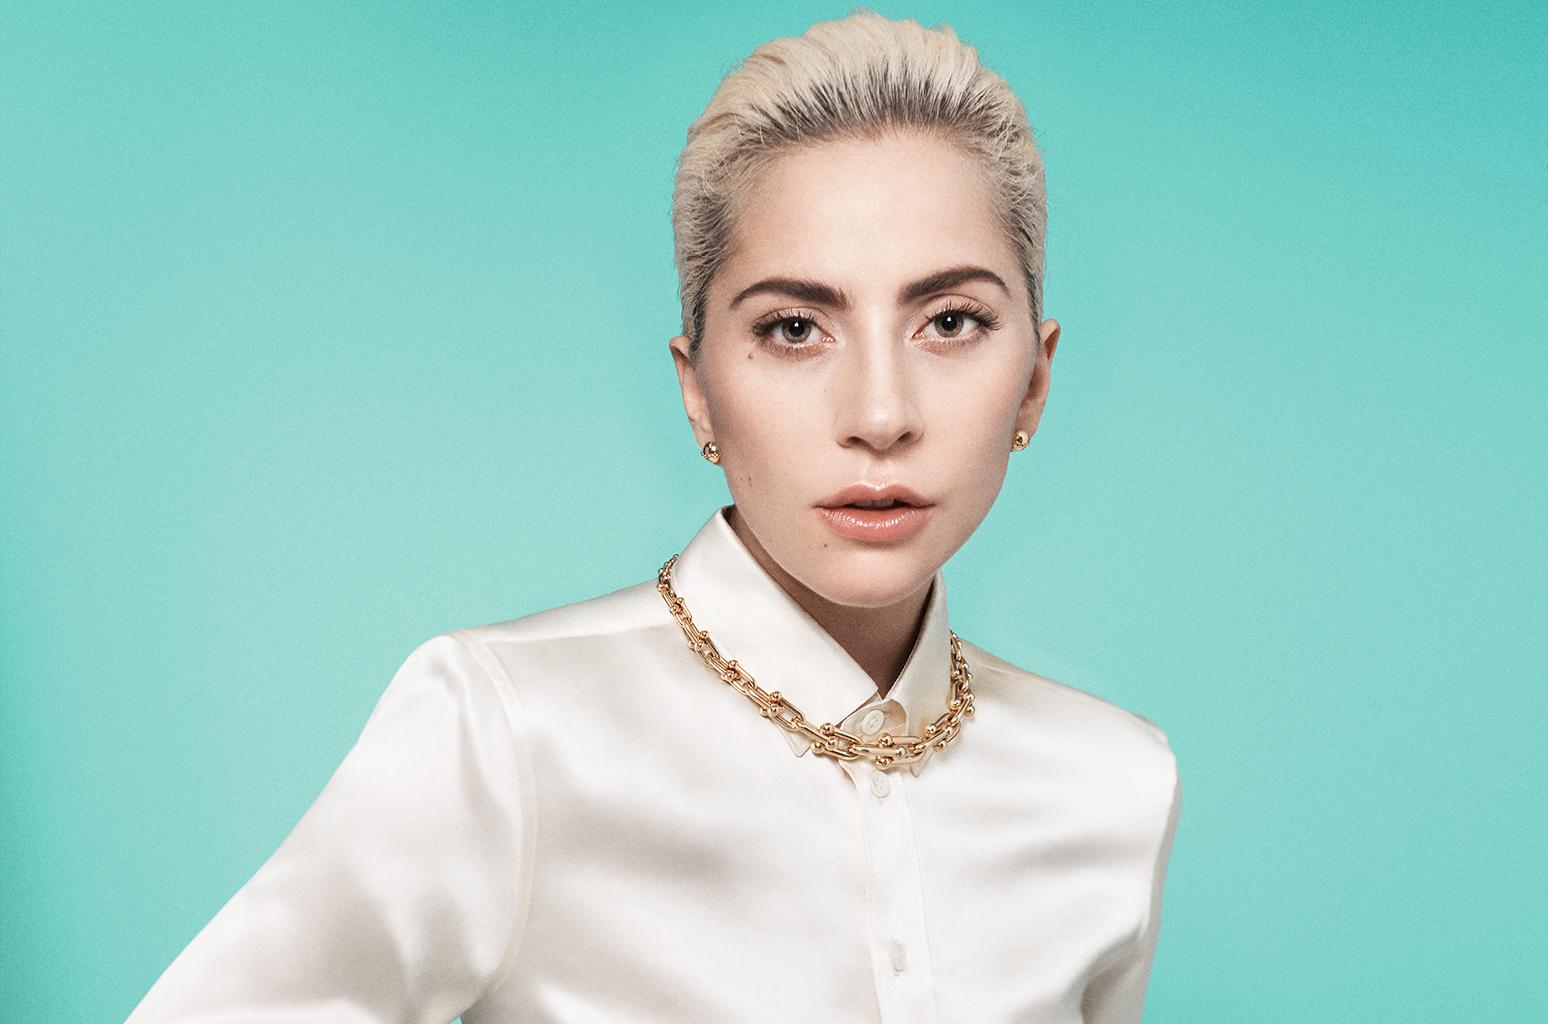 Lady Gaga Hot Bikini Images, Leaked Topless Photos-4162